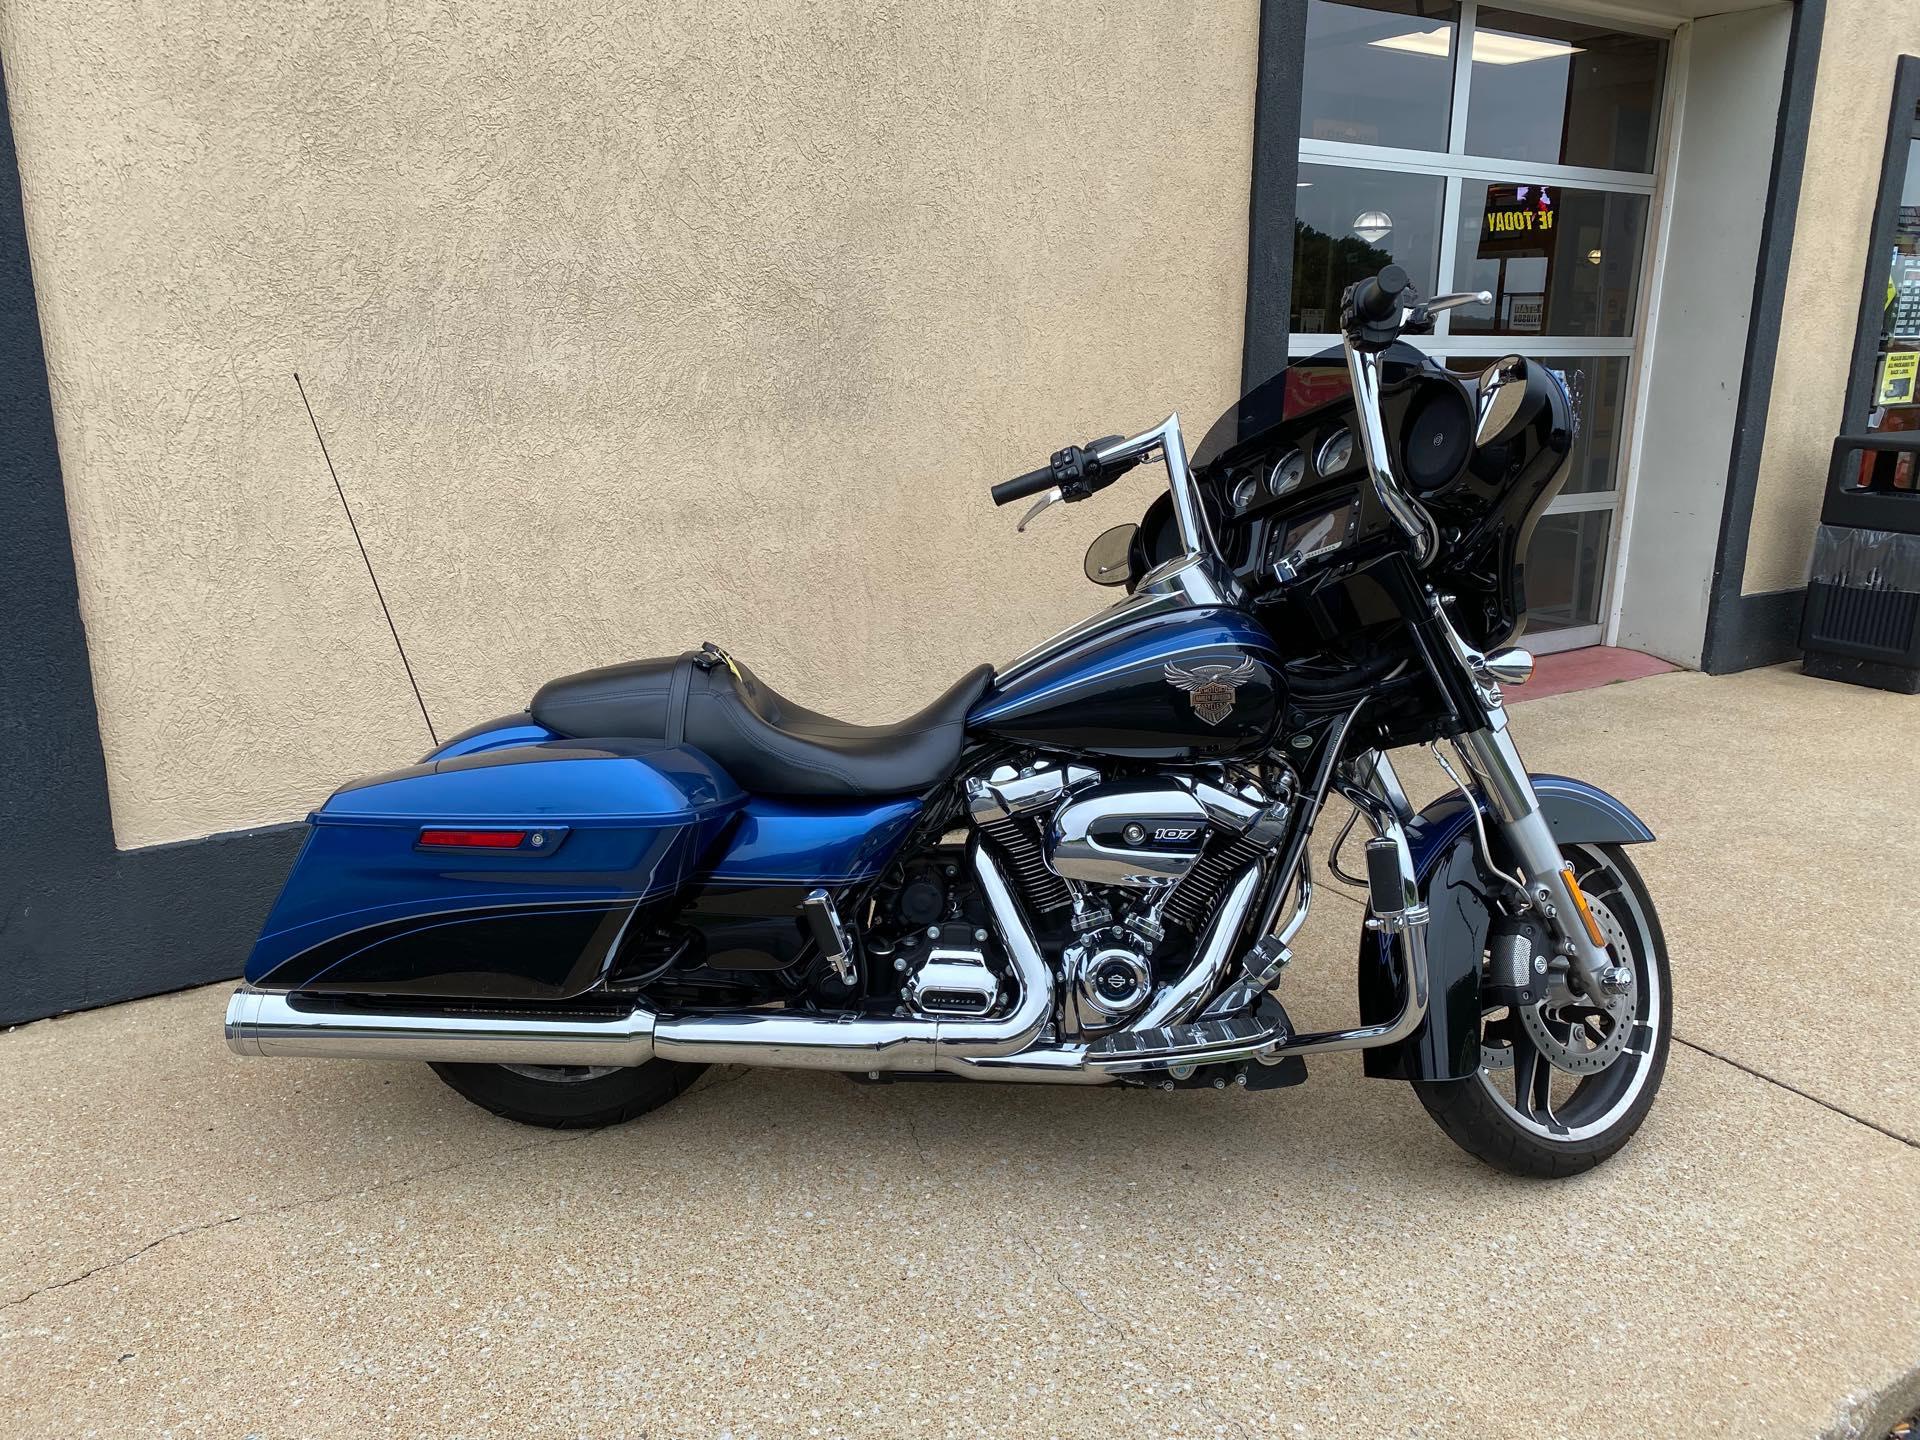 2018 Harley-Davidson Street Glide Special at Gold Star Harley-Davidson